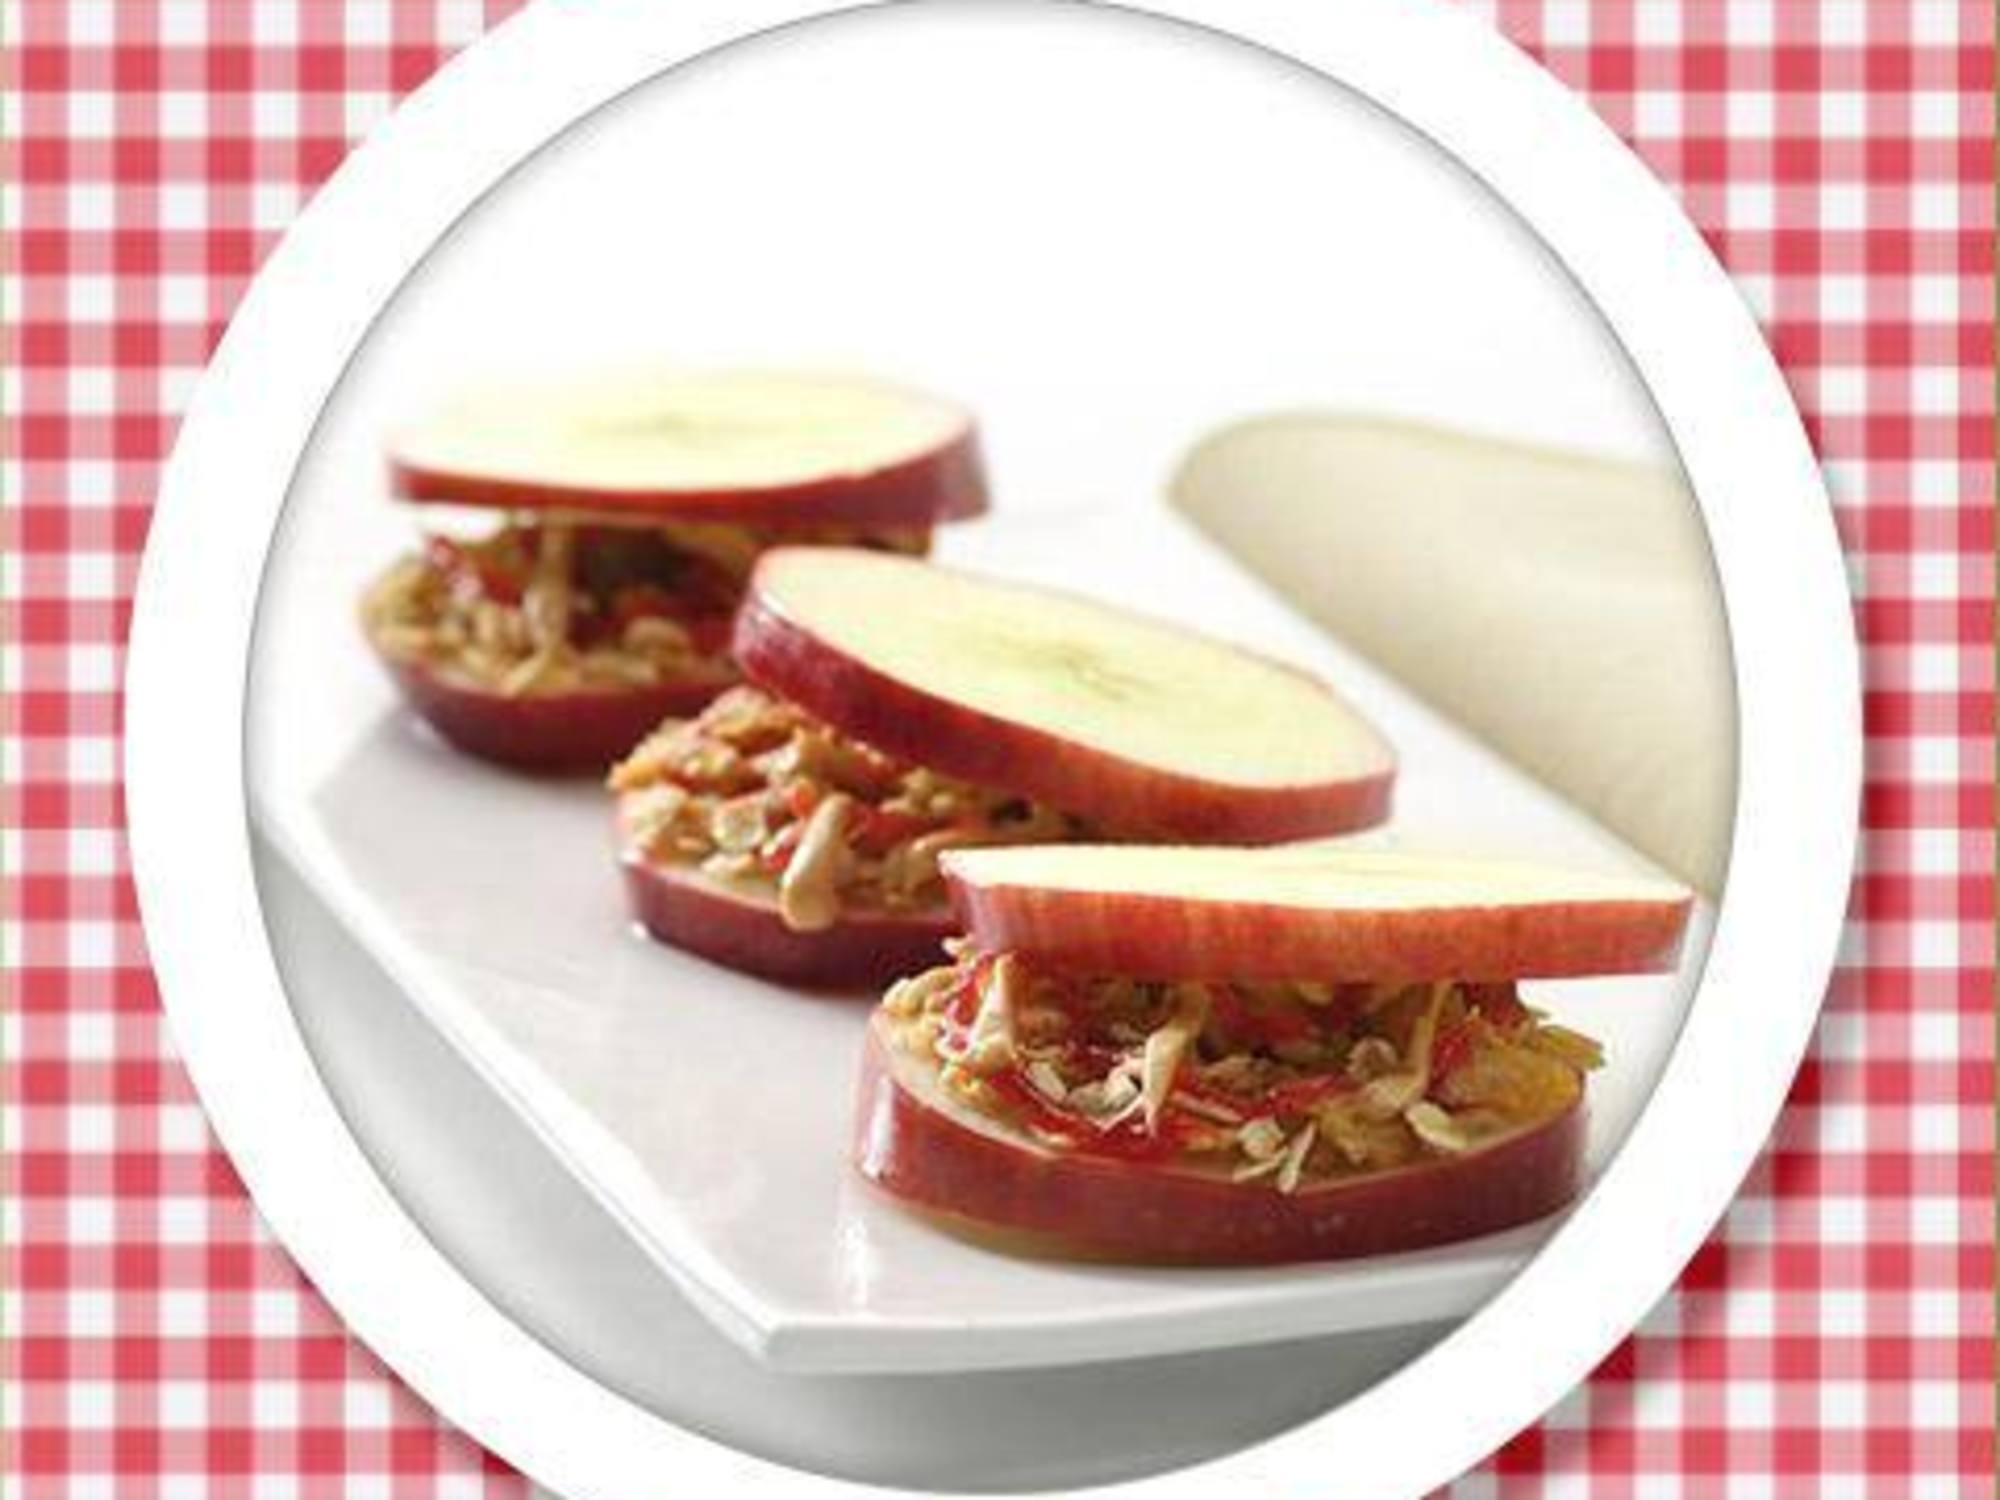 Recipe of Sweet Apple Slices